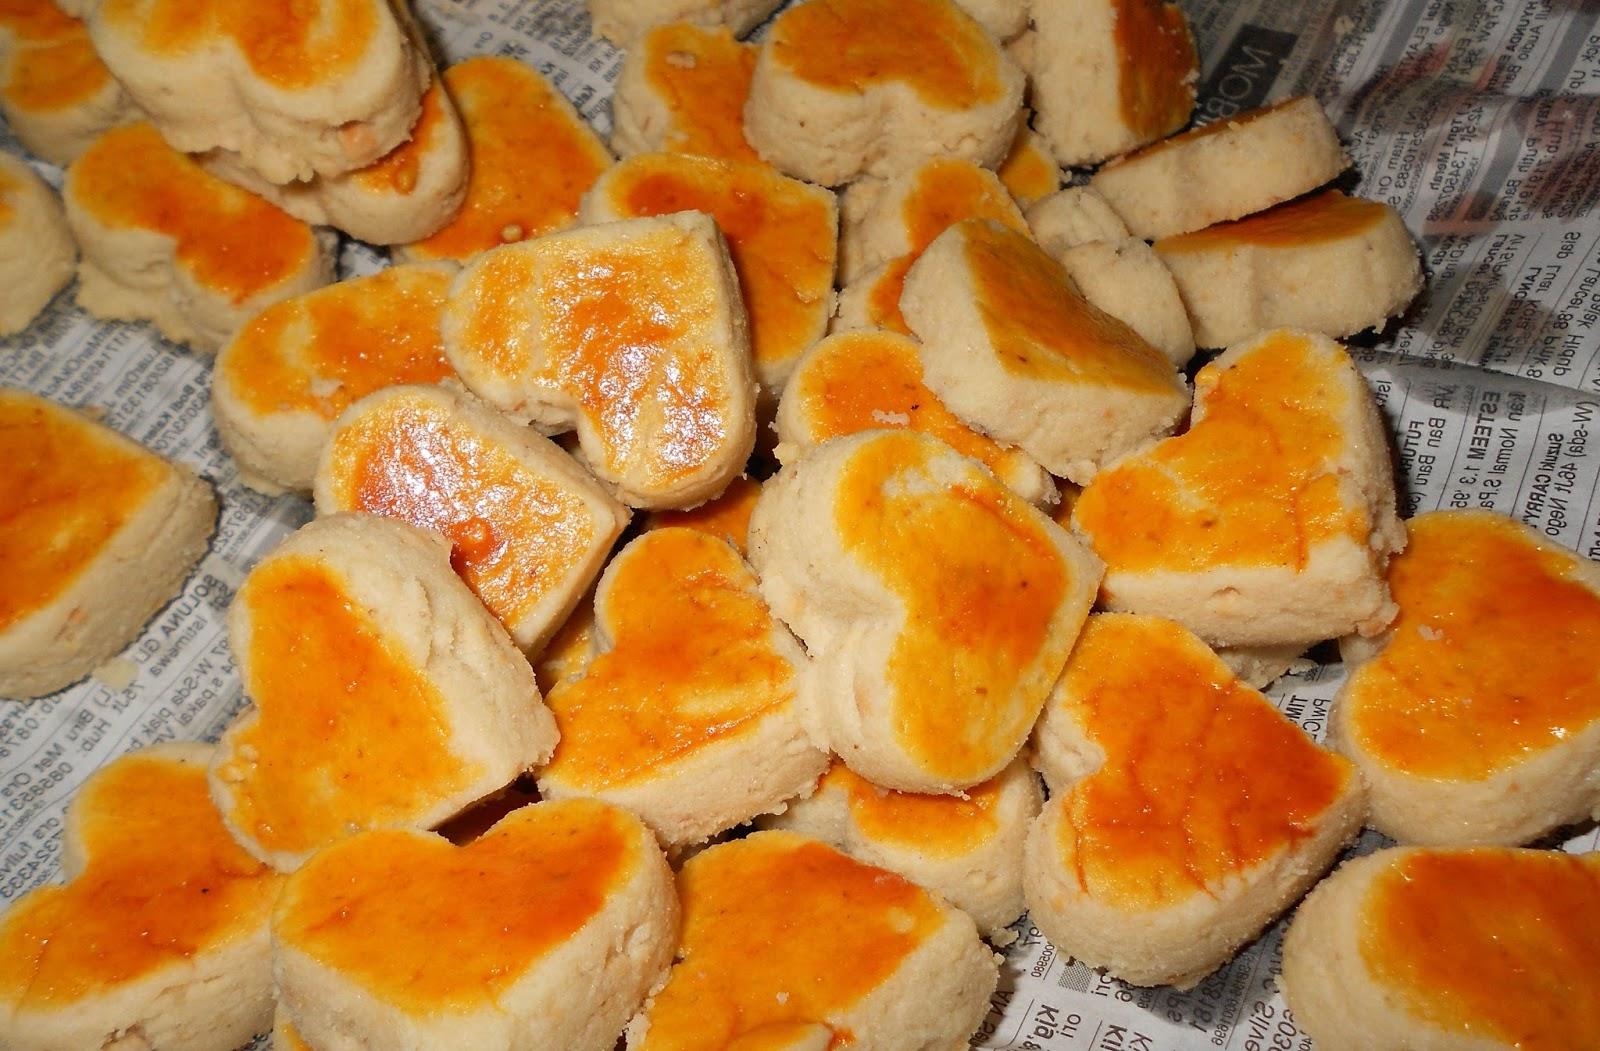 Resep dan Cara Membuat Kue Kacang Tanah  Dapur Lagi